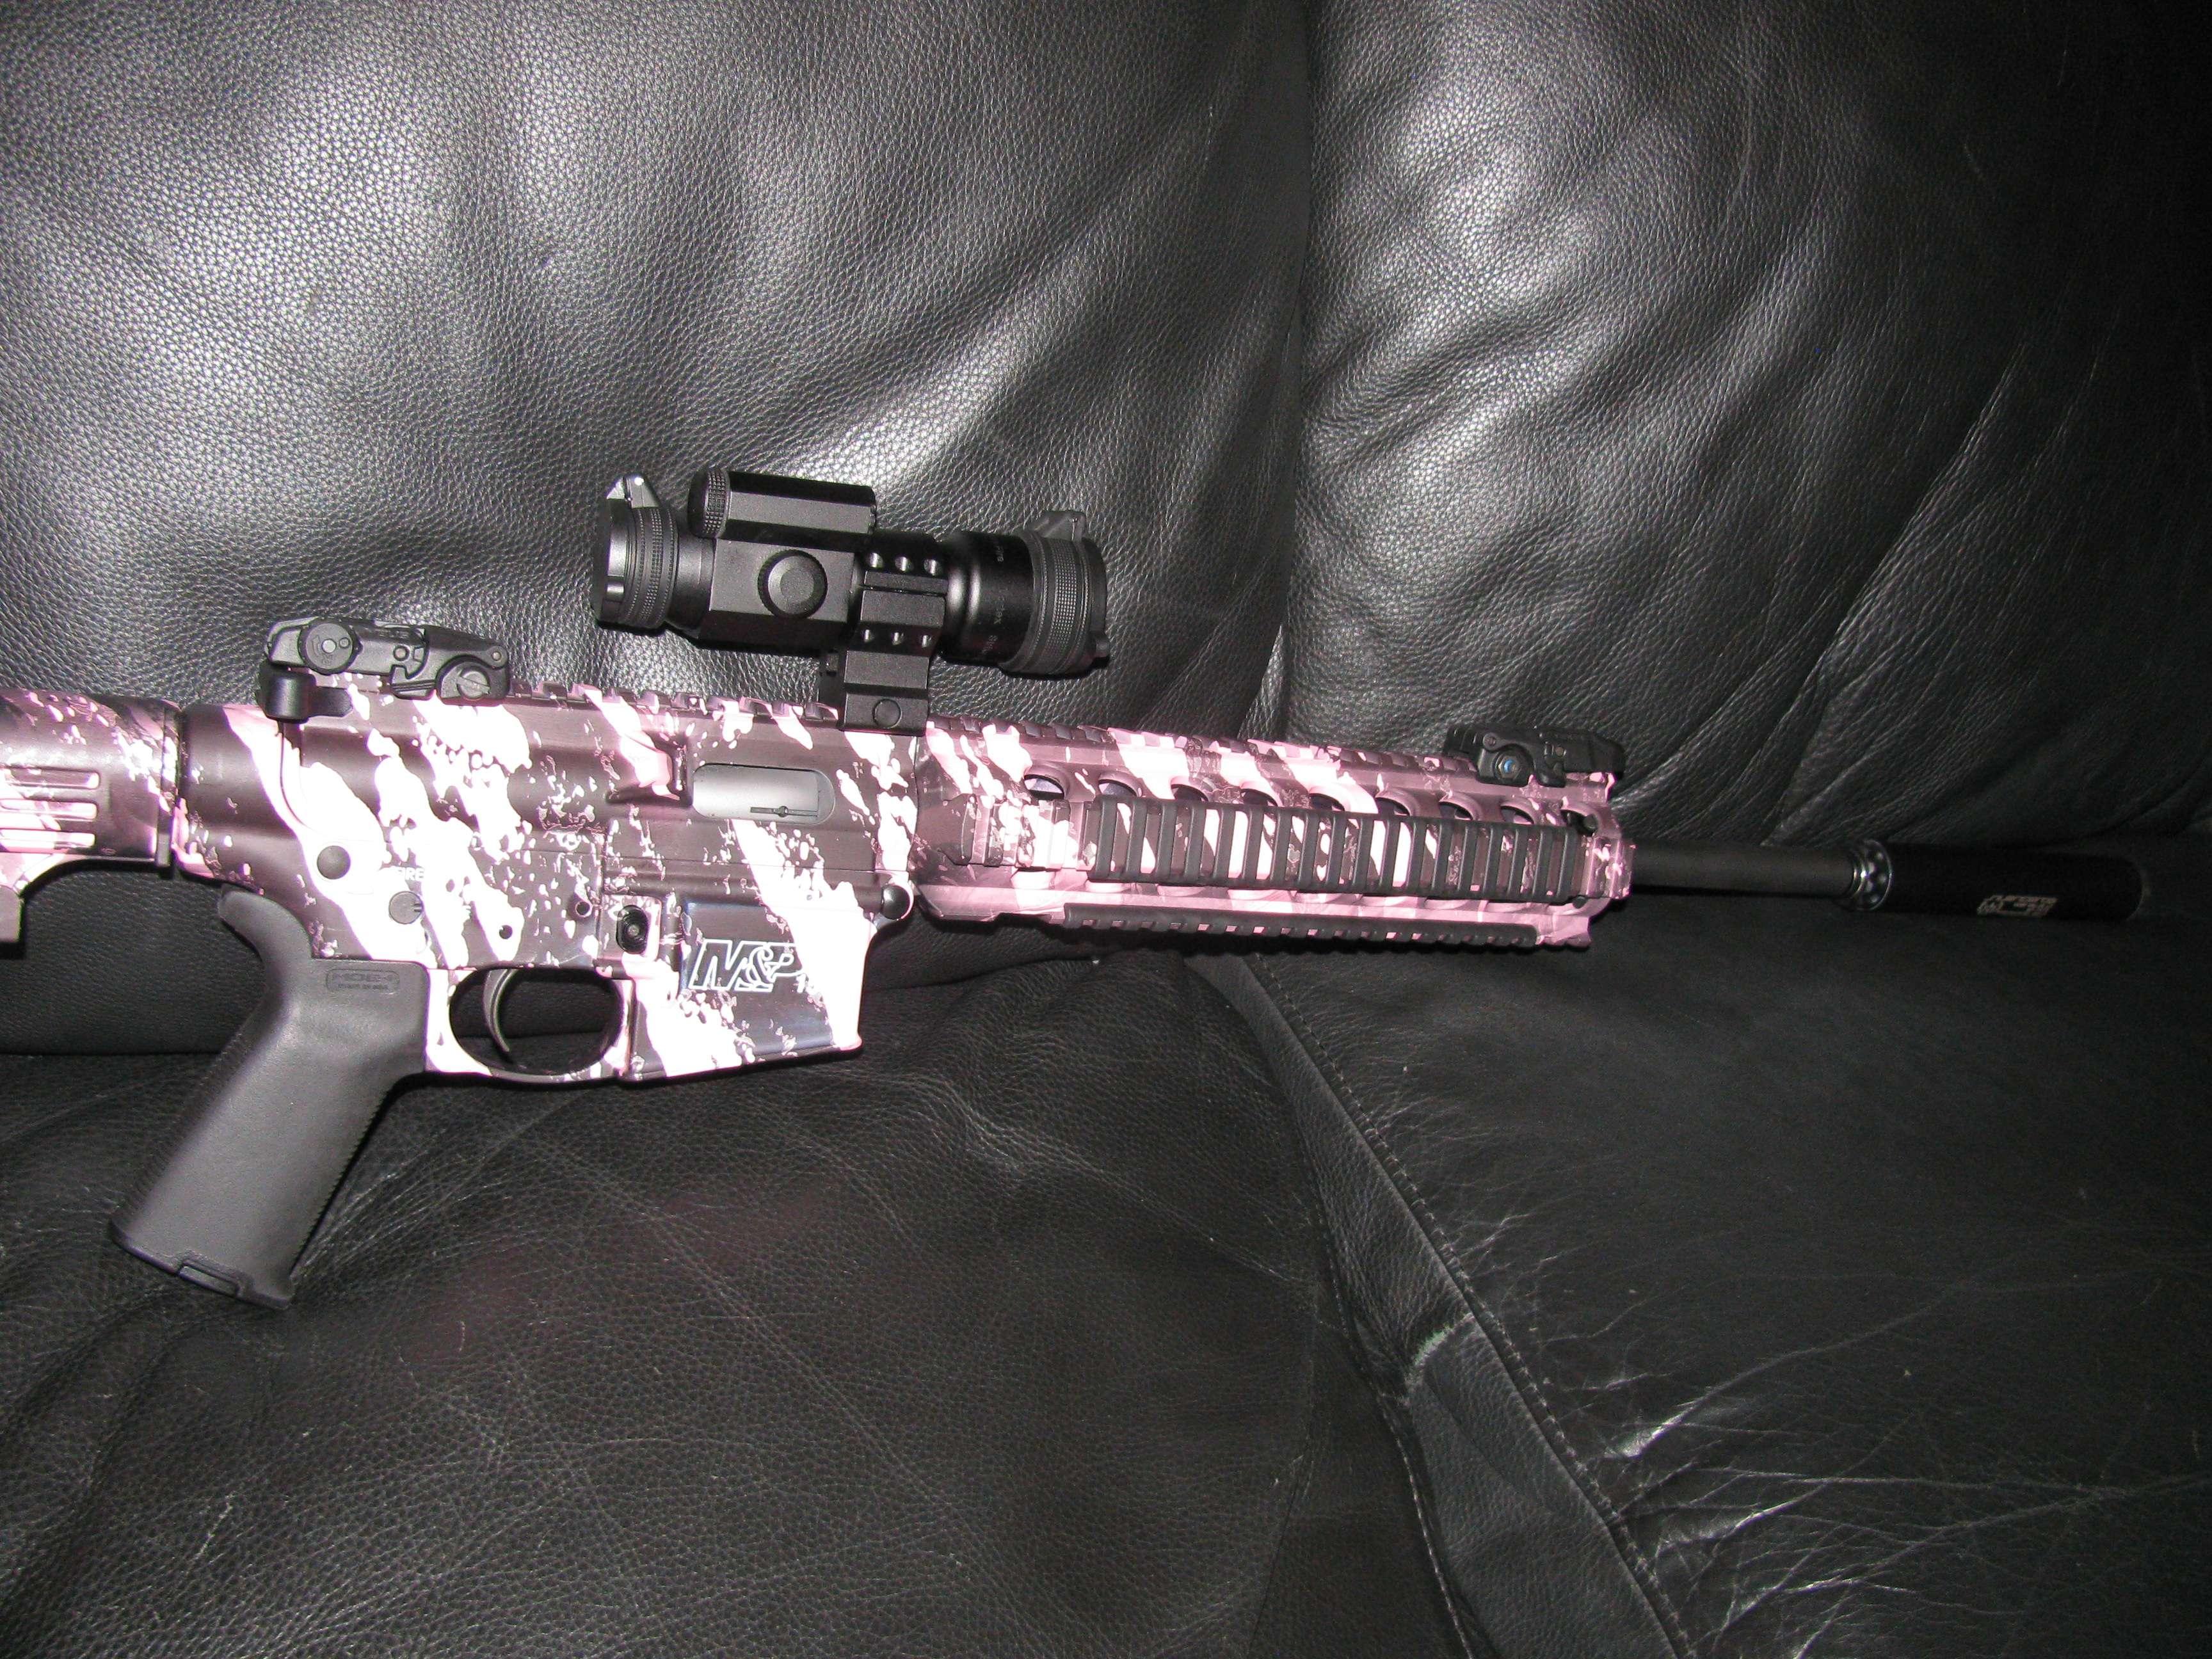 Smith and Wesson M&P15-22 Picture Thread - .22 Rifle/Rimfire Discussion